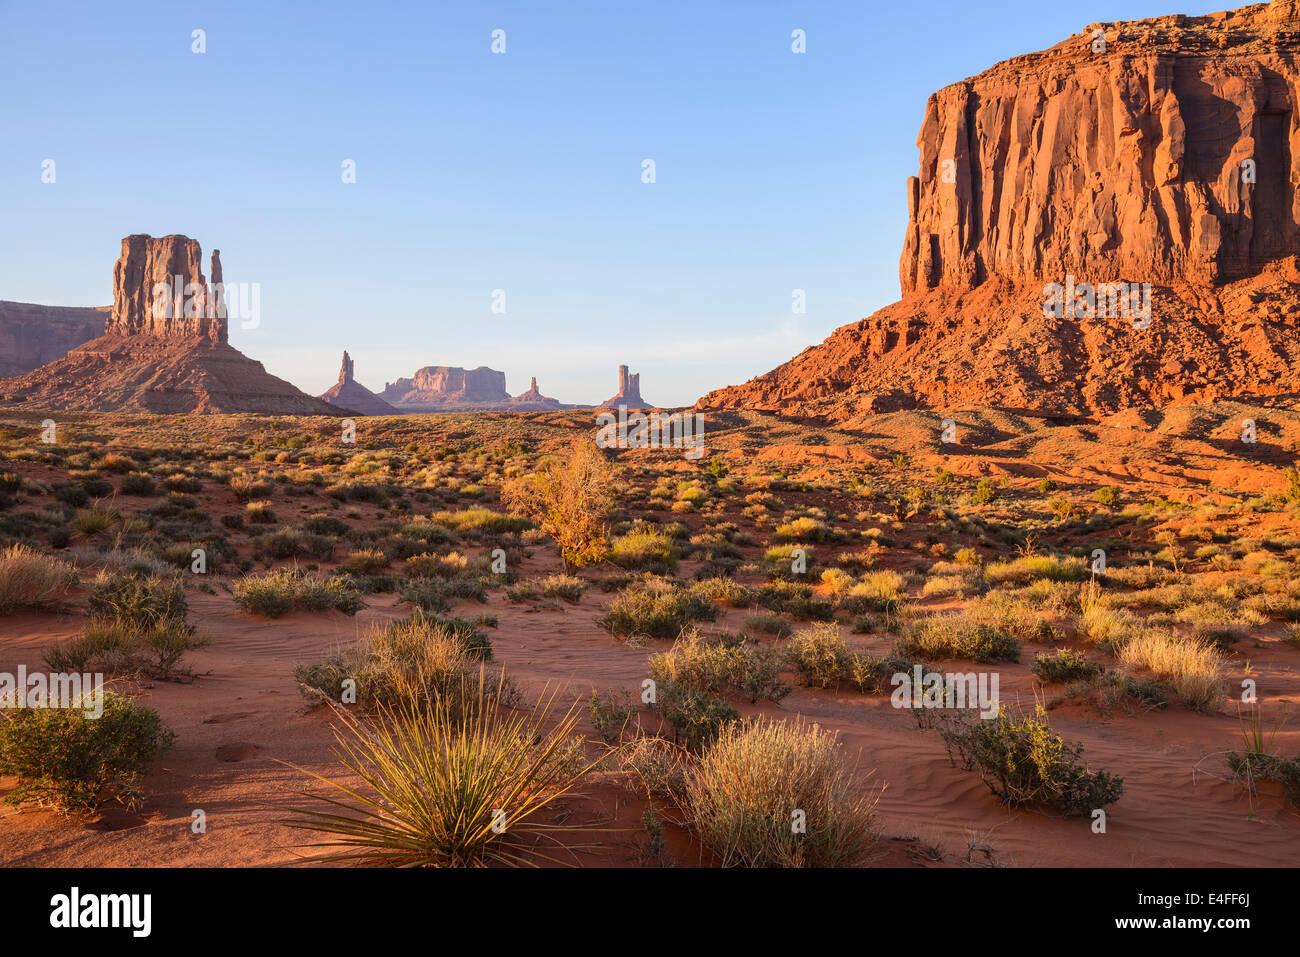 Monument Valley, Merrick Butte. Arizona, USA - Stock Image